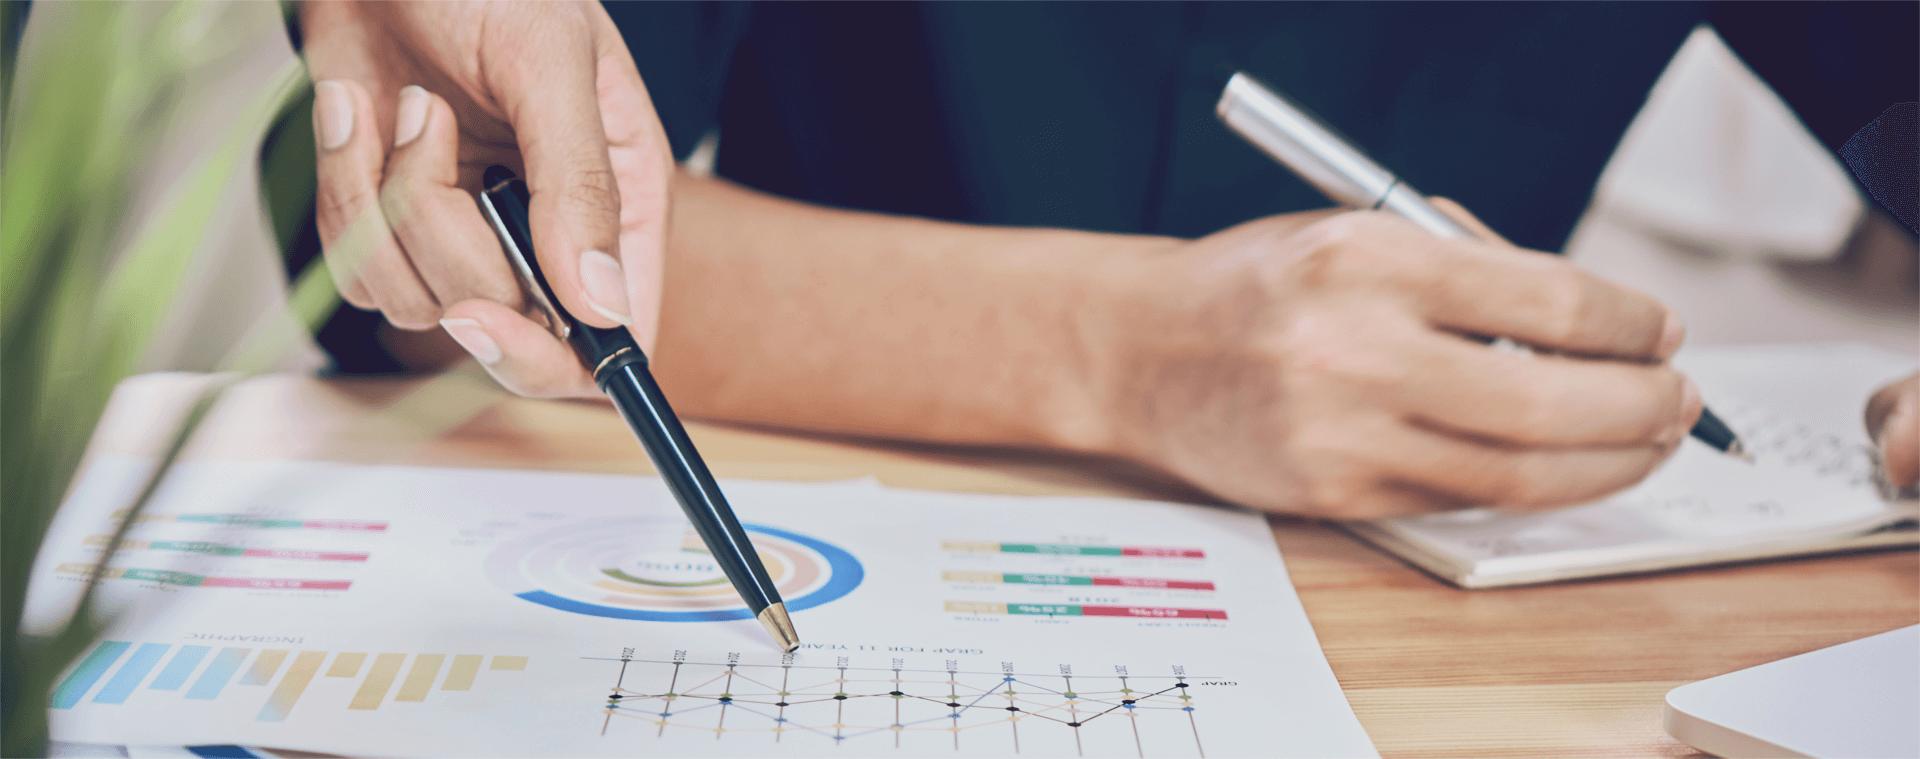 practicas big data